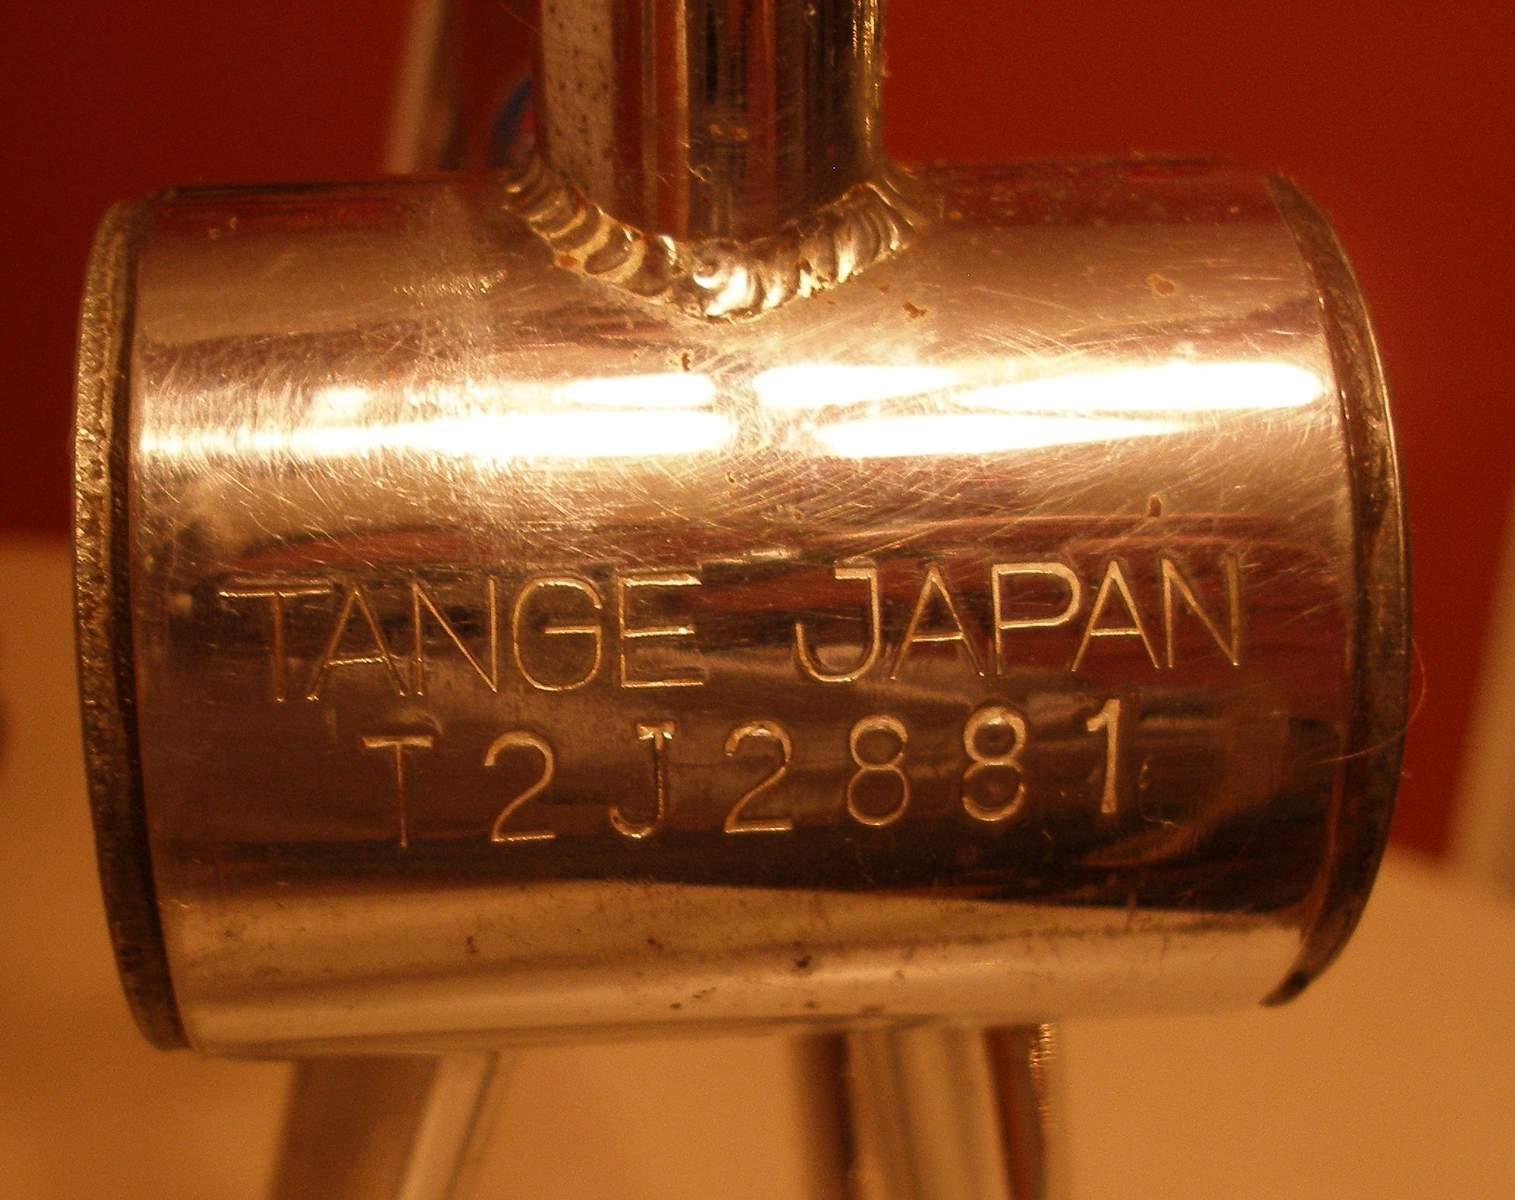 https://s3.amazonaws.com/uploads.bmxmuseum.com/user-images/47558/tange-bb58a1867552.jpg